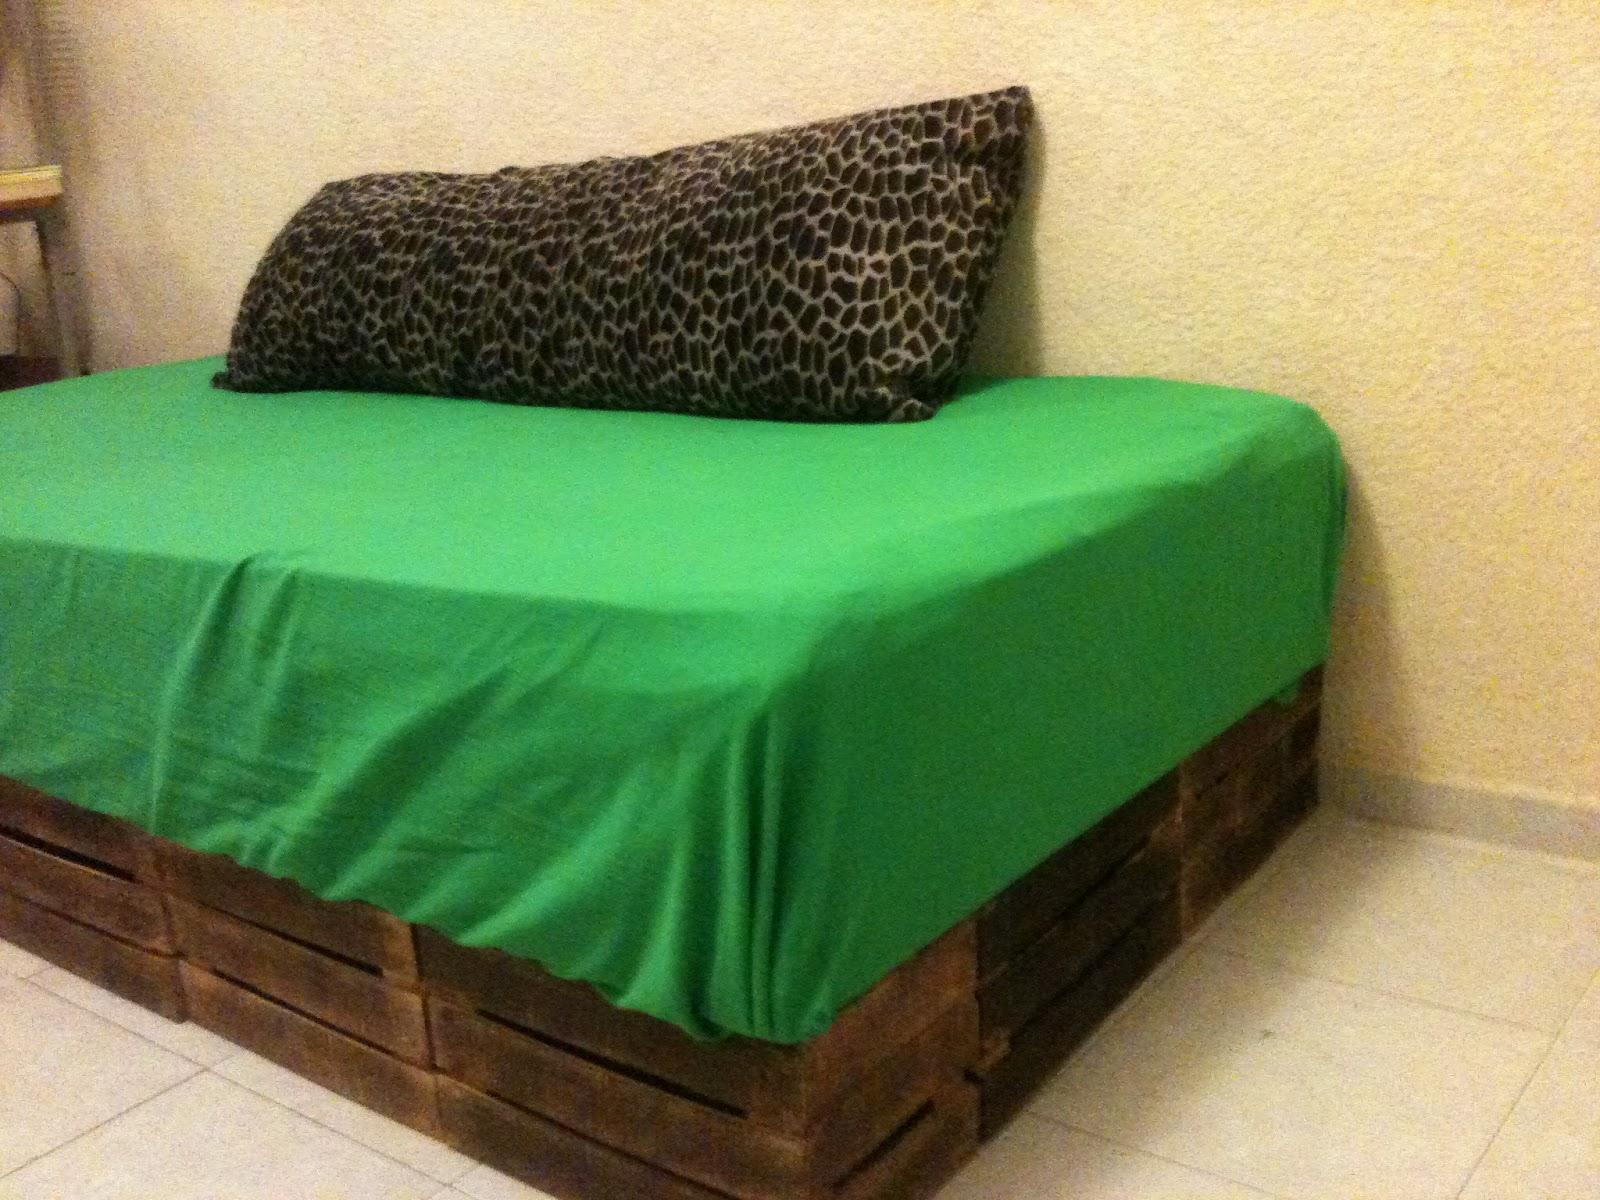 De tiliches chunches y otros triques huacama o sof cama - Como hacer un sofa cama ...